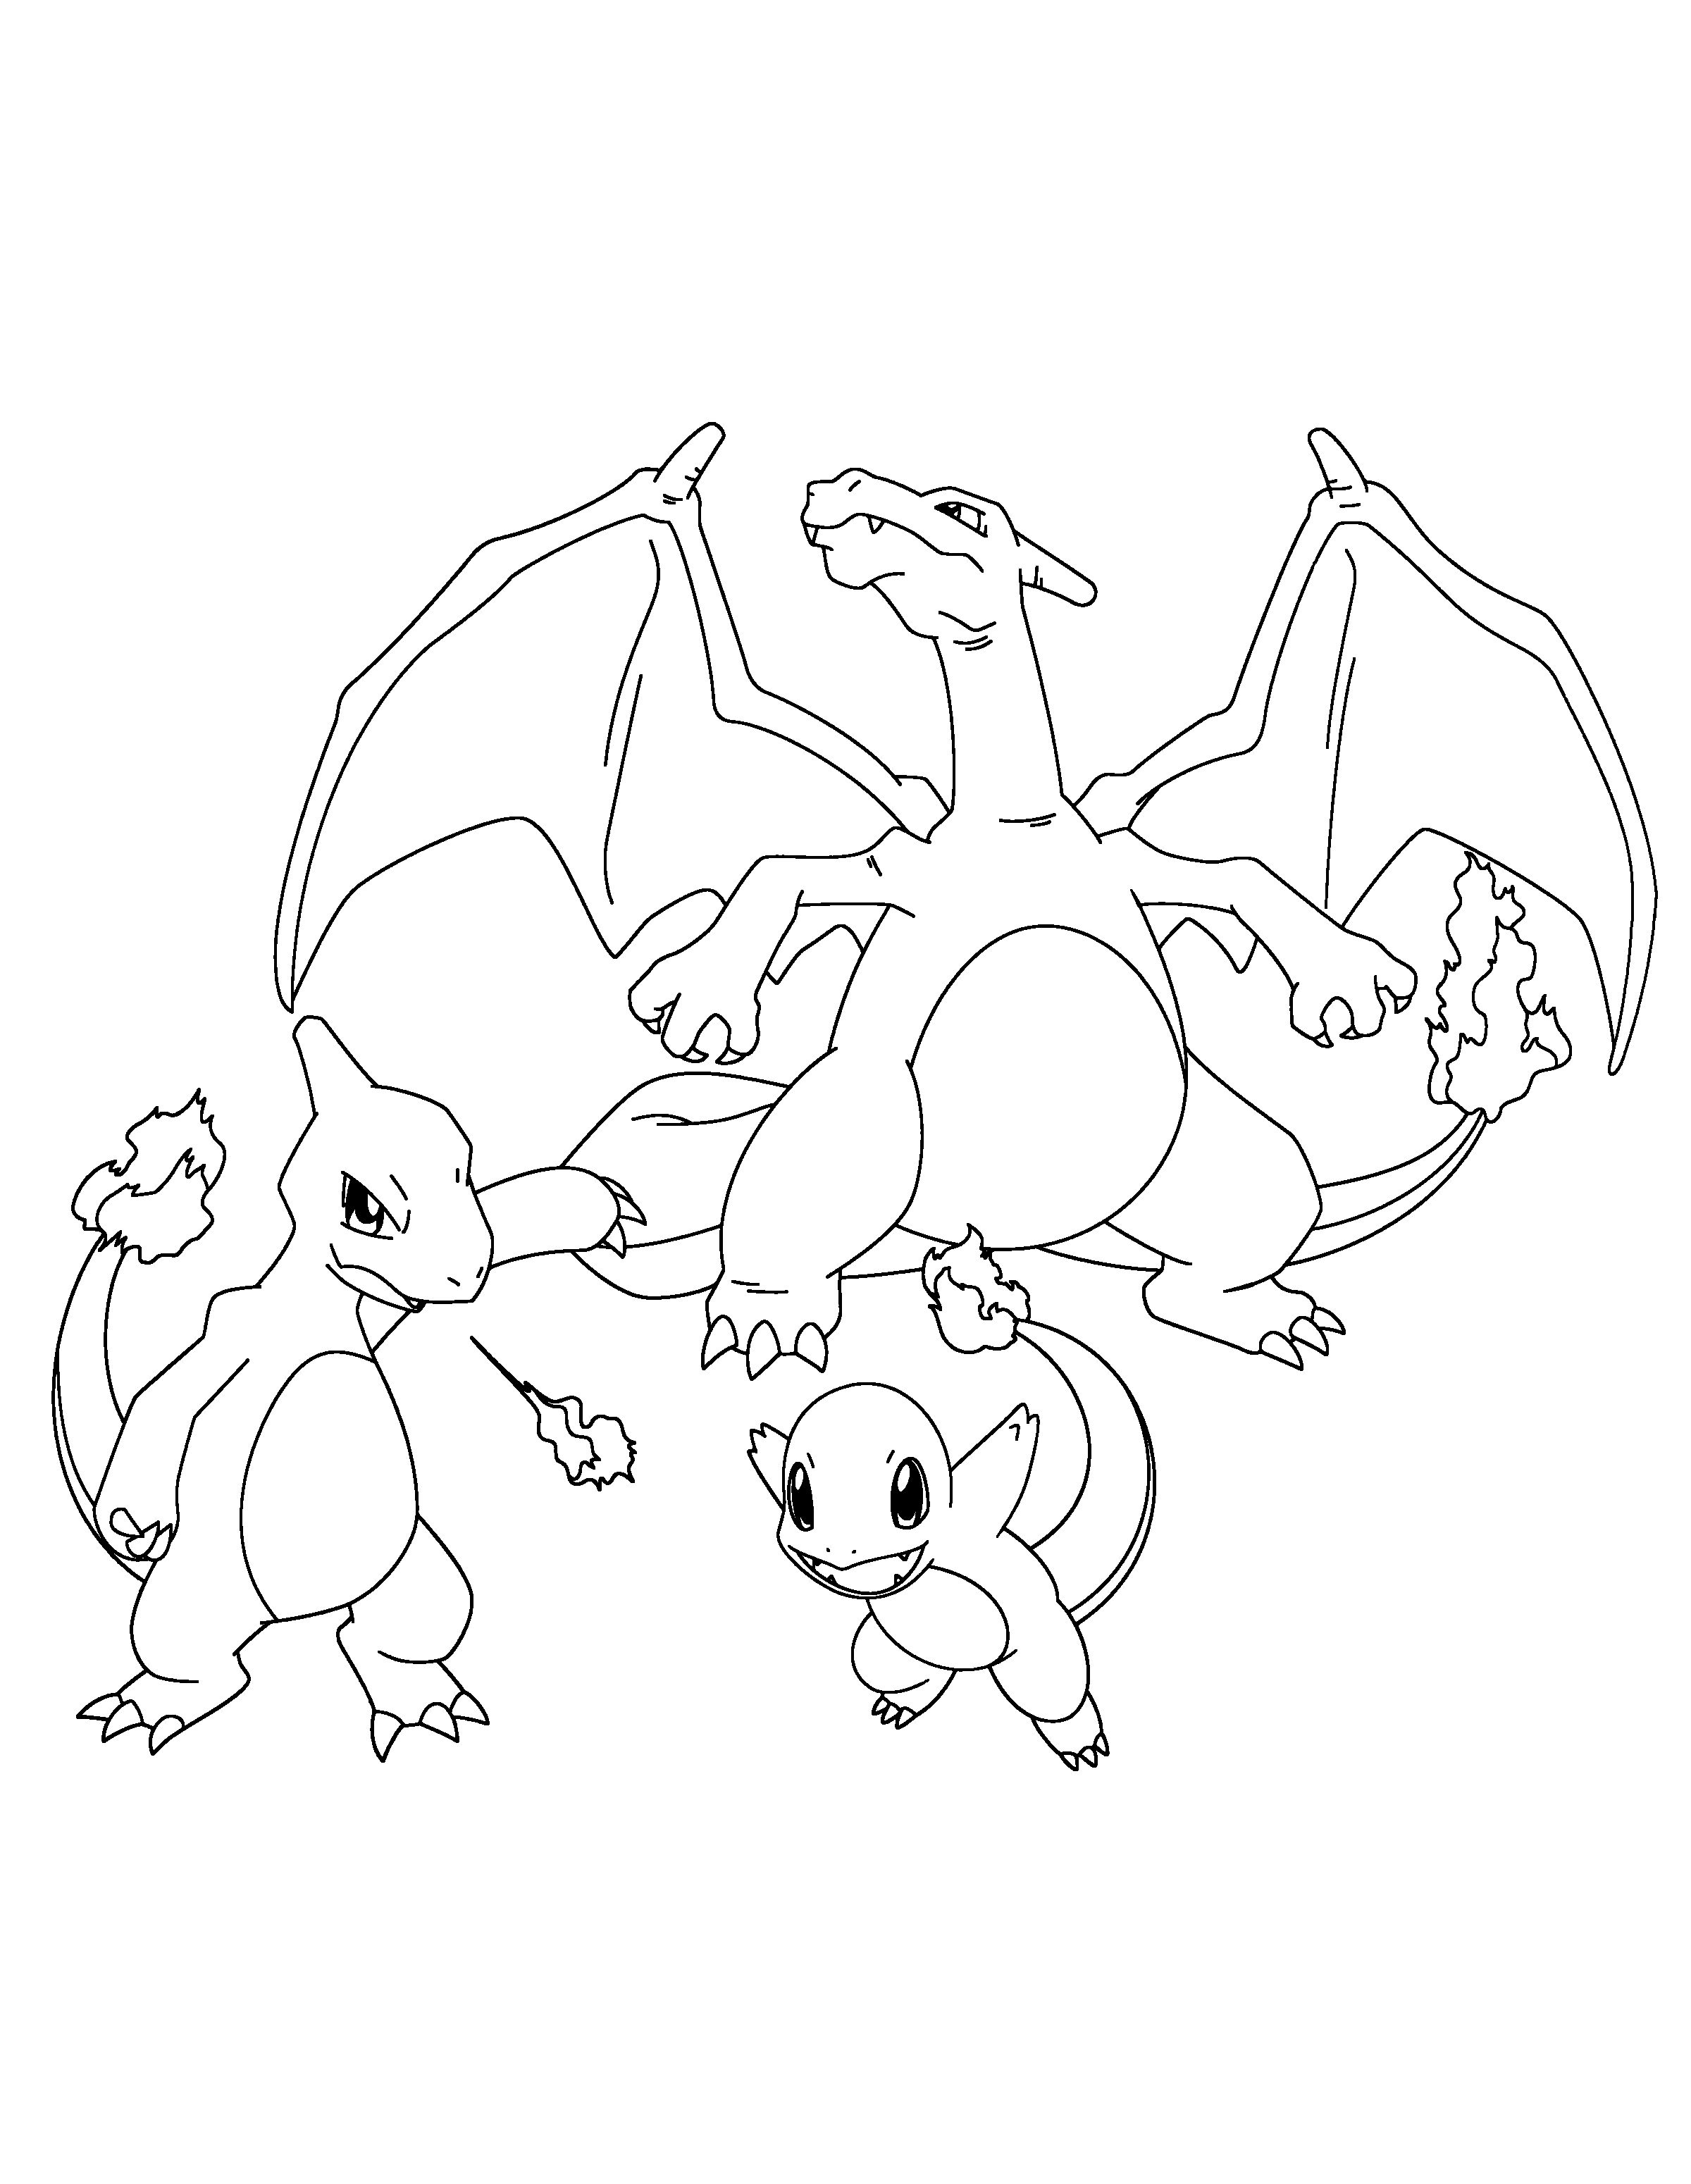 Pokemon Kleurplaten Riolu.Pokemons Kleurplaten Charmander Olivinum Com Charmander Home